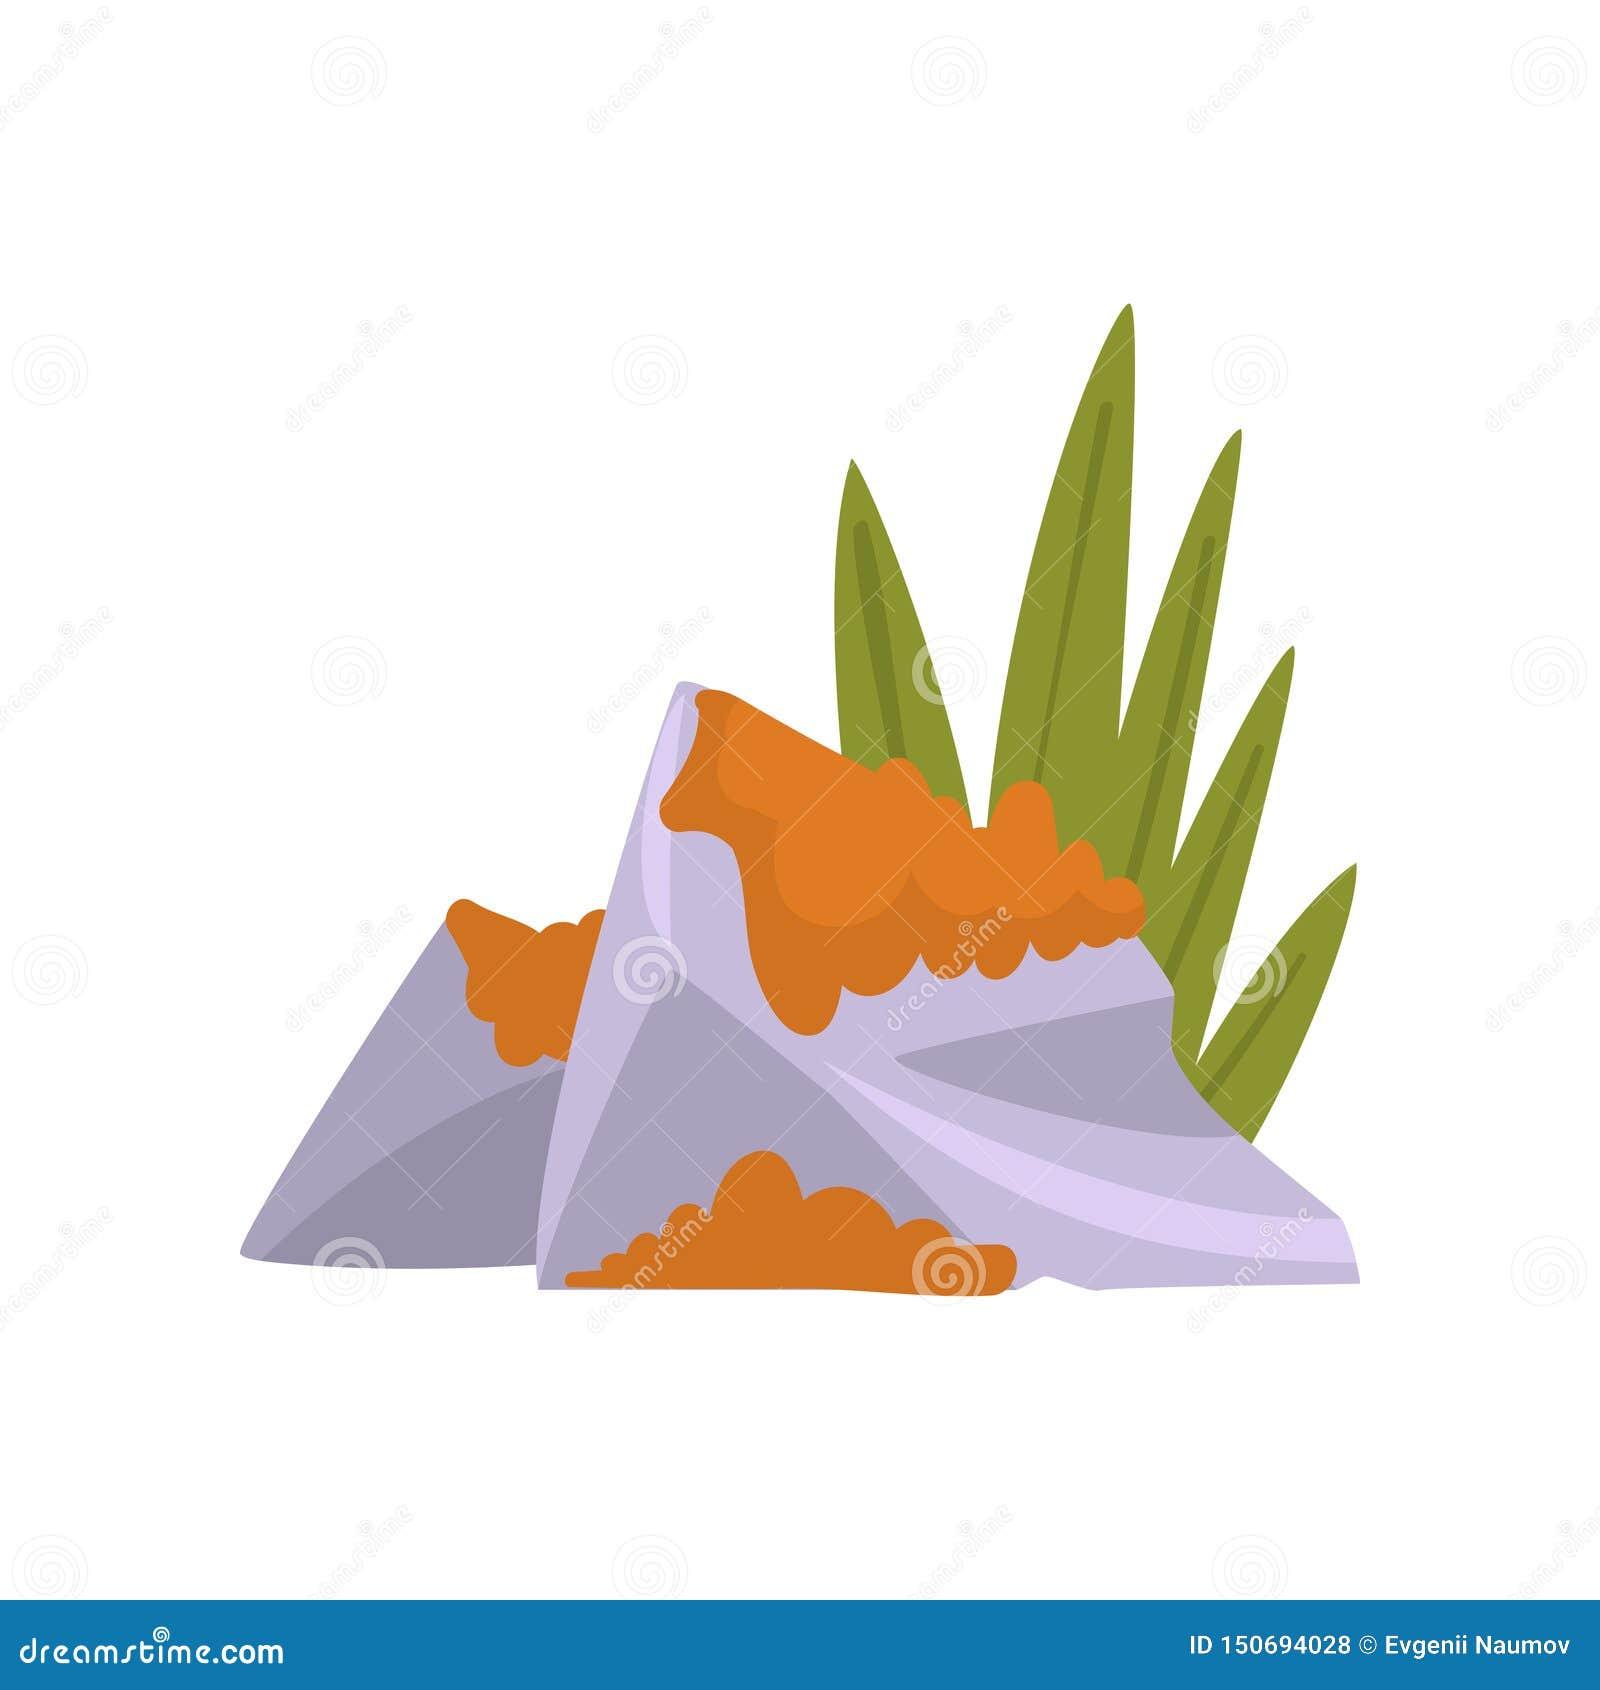 Granit Boulder mit Gras und Moos, Naturlandschafts-Gestaltungselement-Vektor-Illustration